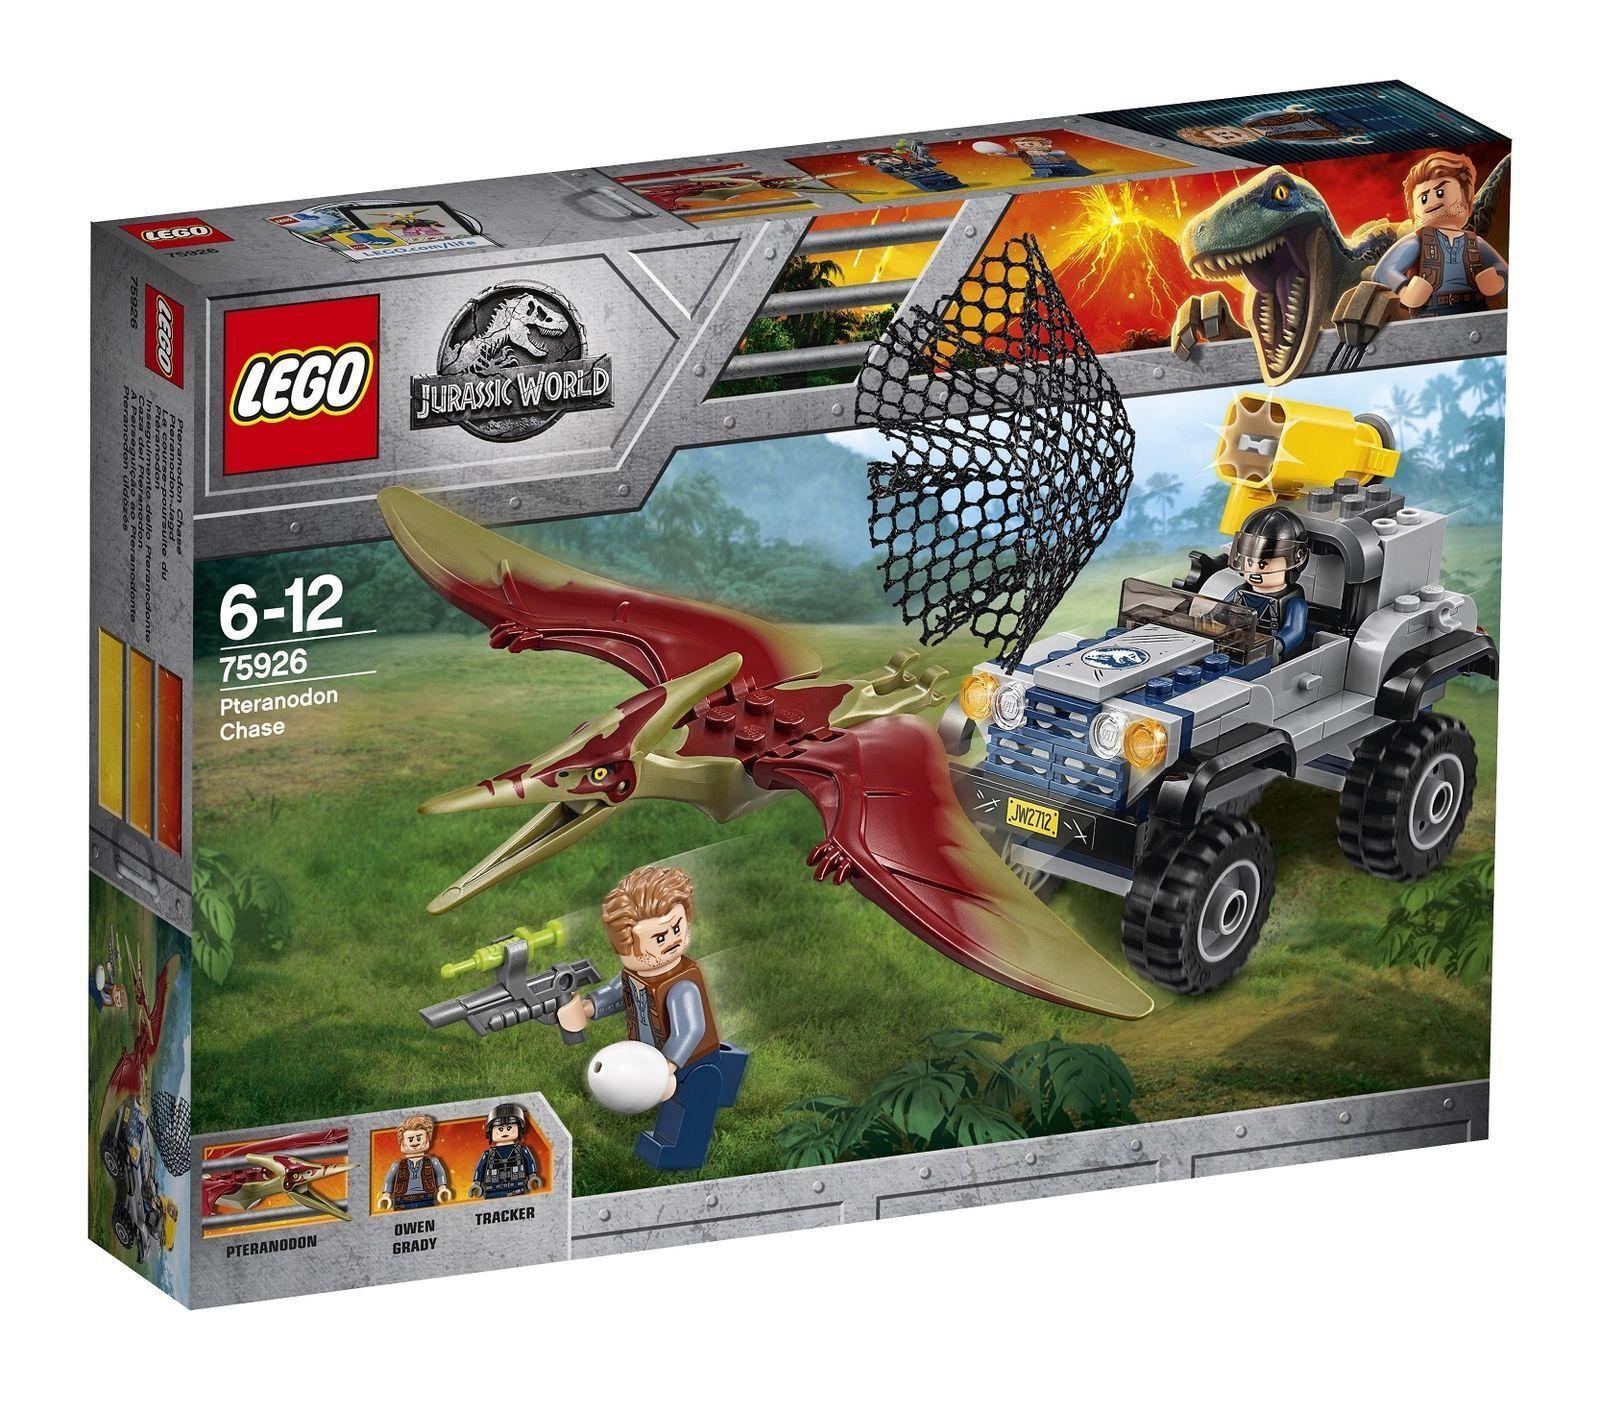 RETIRED RARE LEGO Jurassic World World World Pteranodon Chase 2018 (75926) d06bce